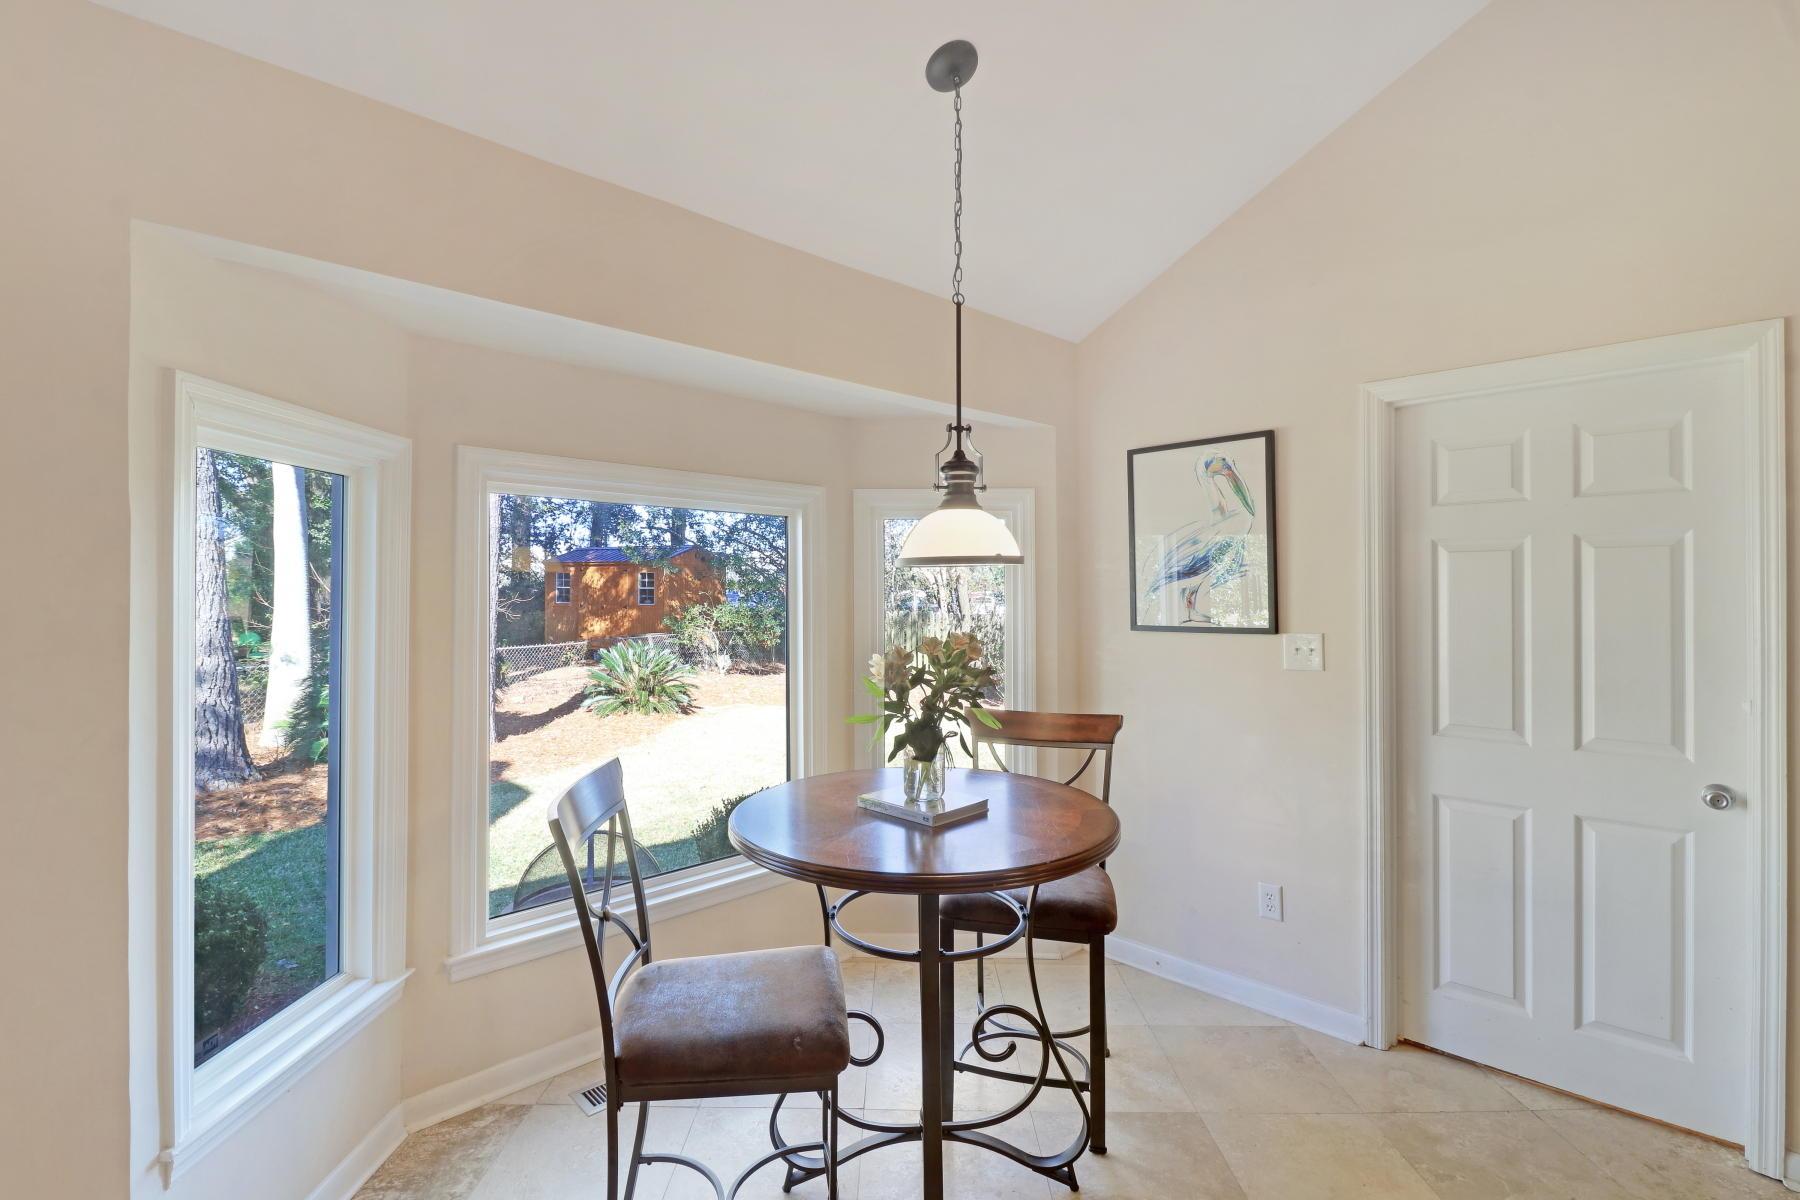 Harrison Acres Homes For Sale - 51 Markfield, Charleston, SC - 10